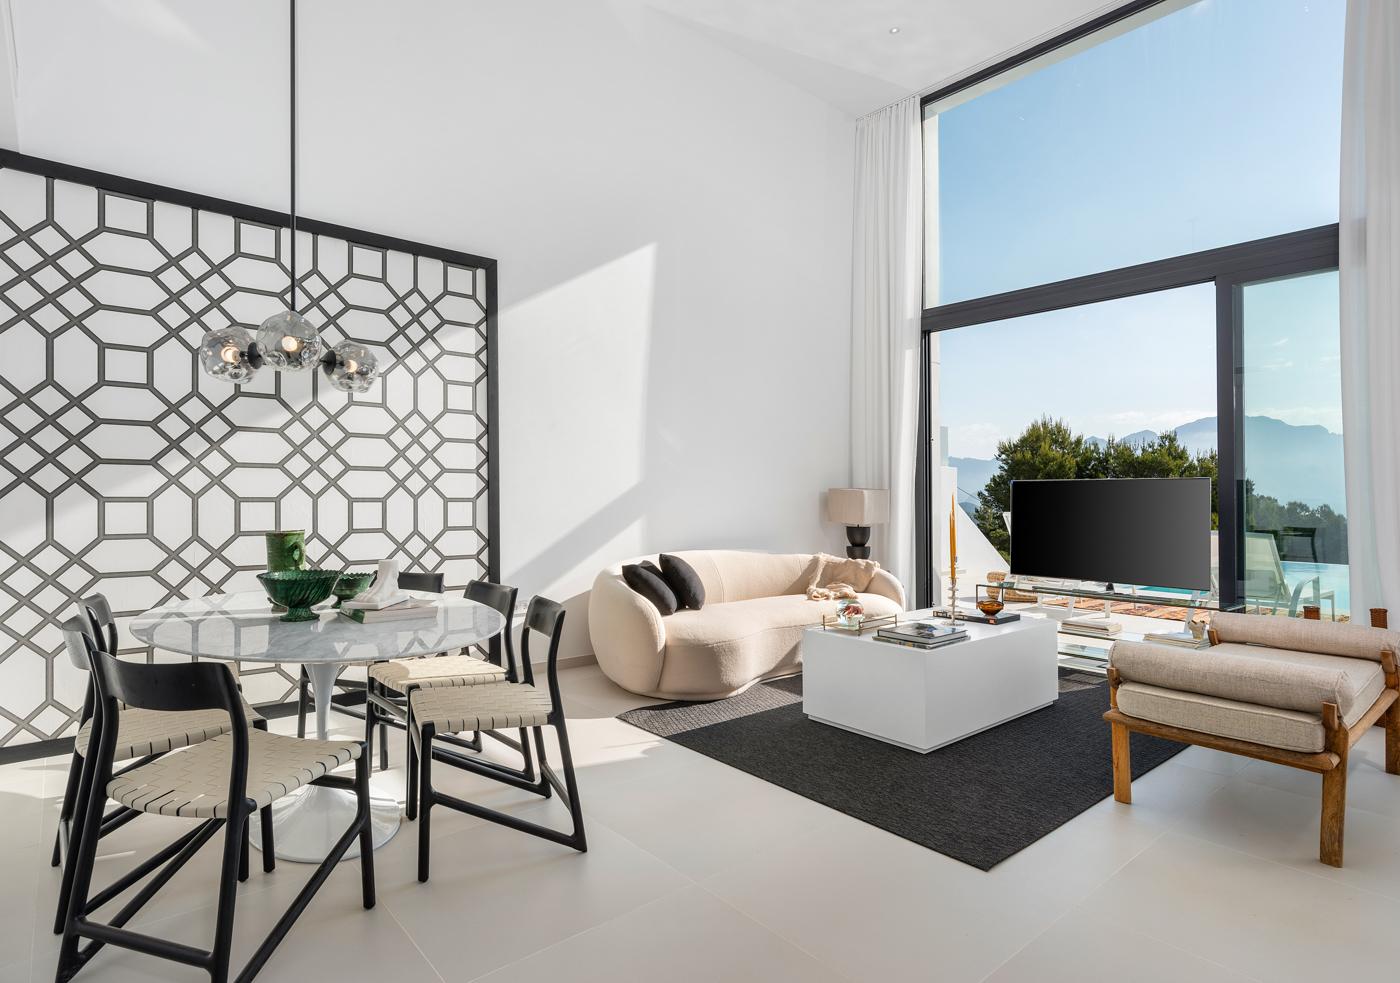 19 - Venecia III - Dining and living room